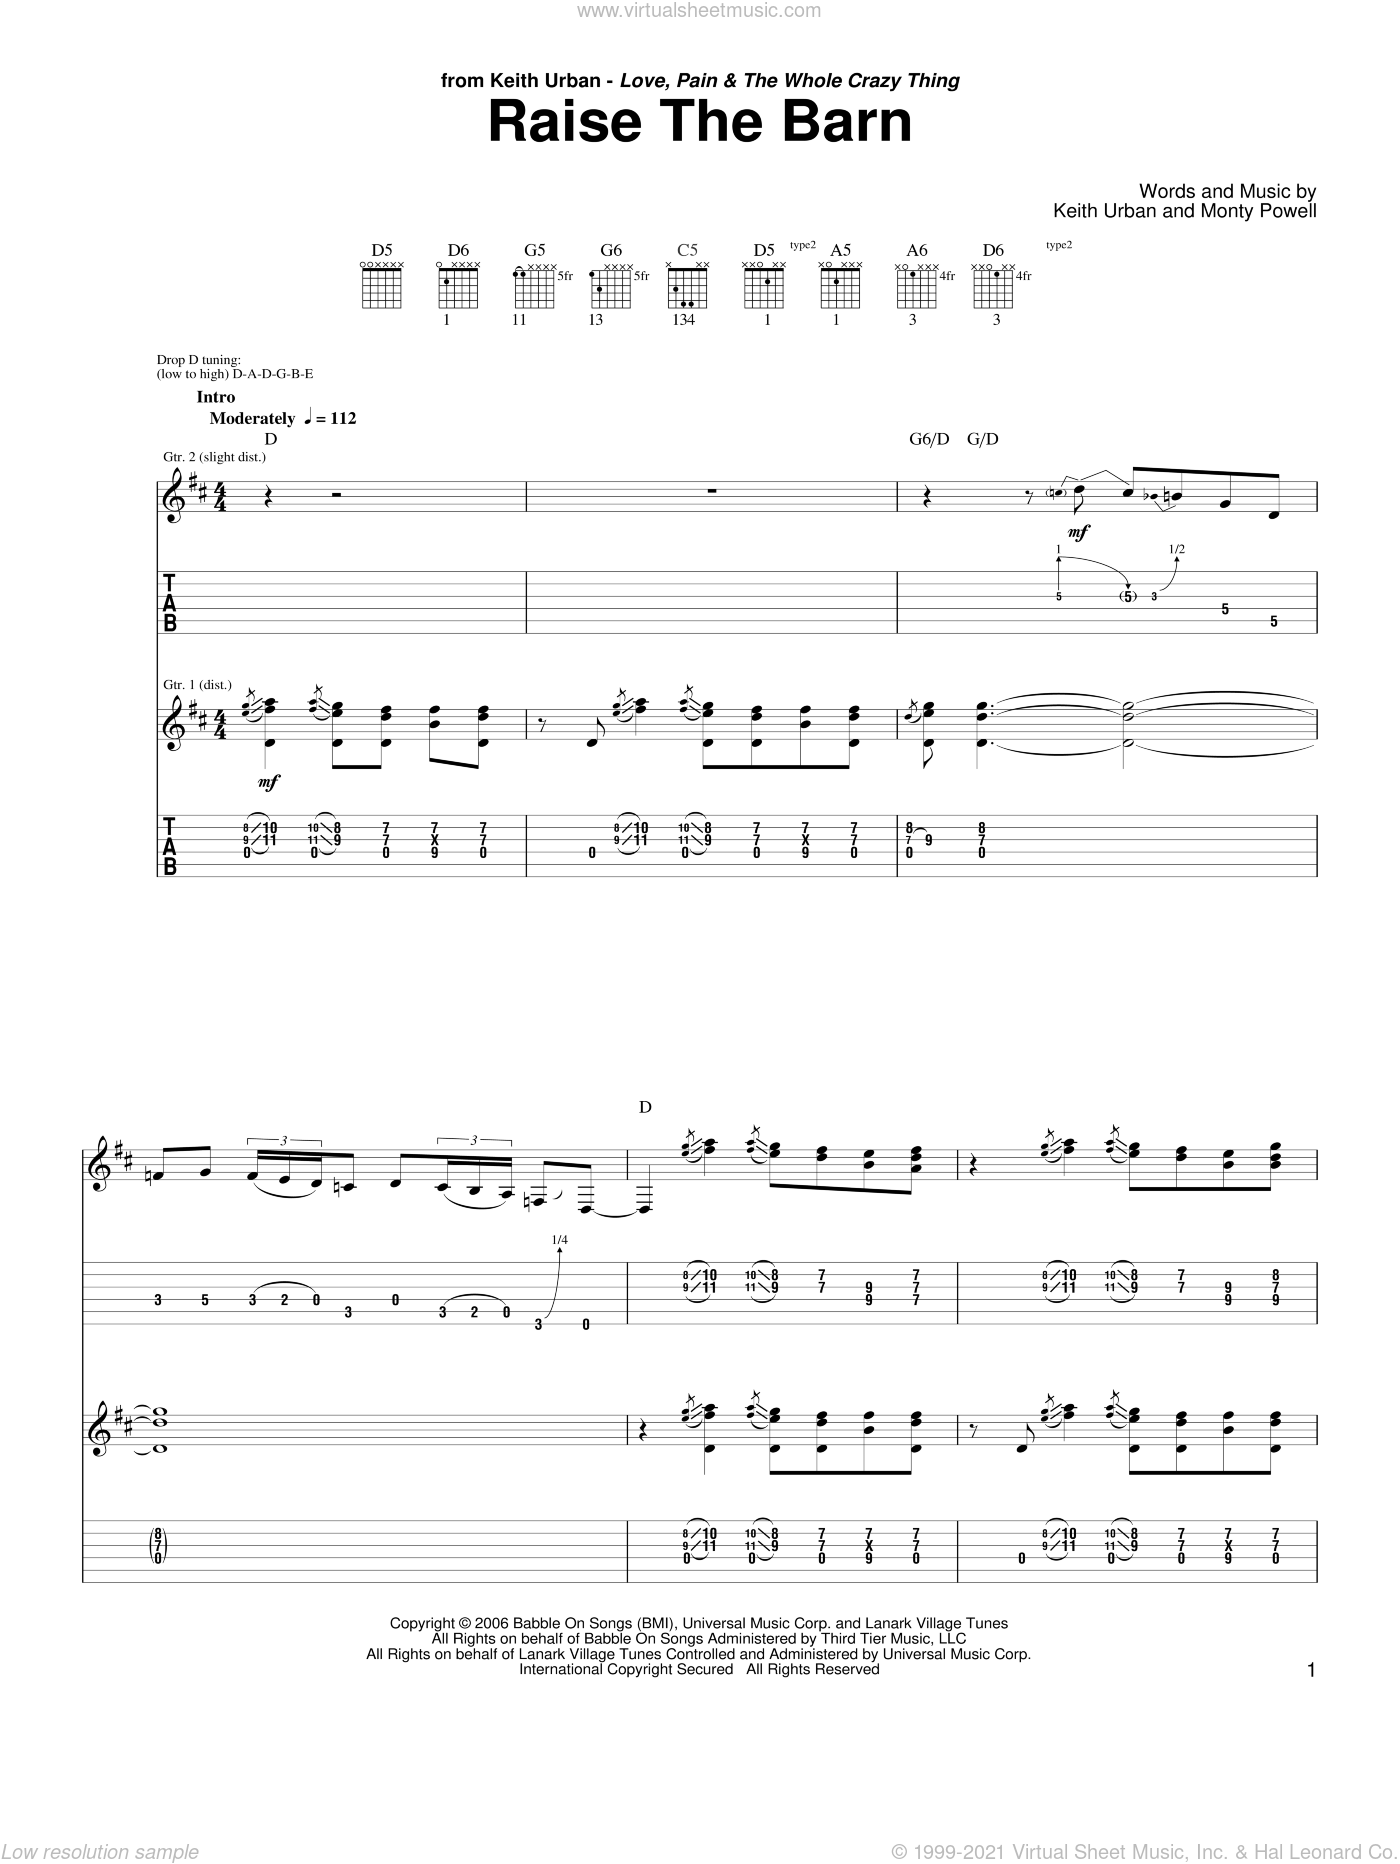 Raise The Barn sheet music for guitar (tablature) by Keith Urban featuring Ronnie Dunn, Ronnie Dunn, Keith Urban and Monty Powell, intermediate skill level